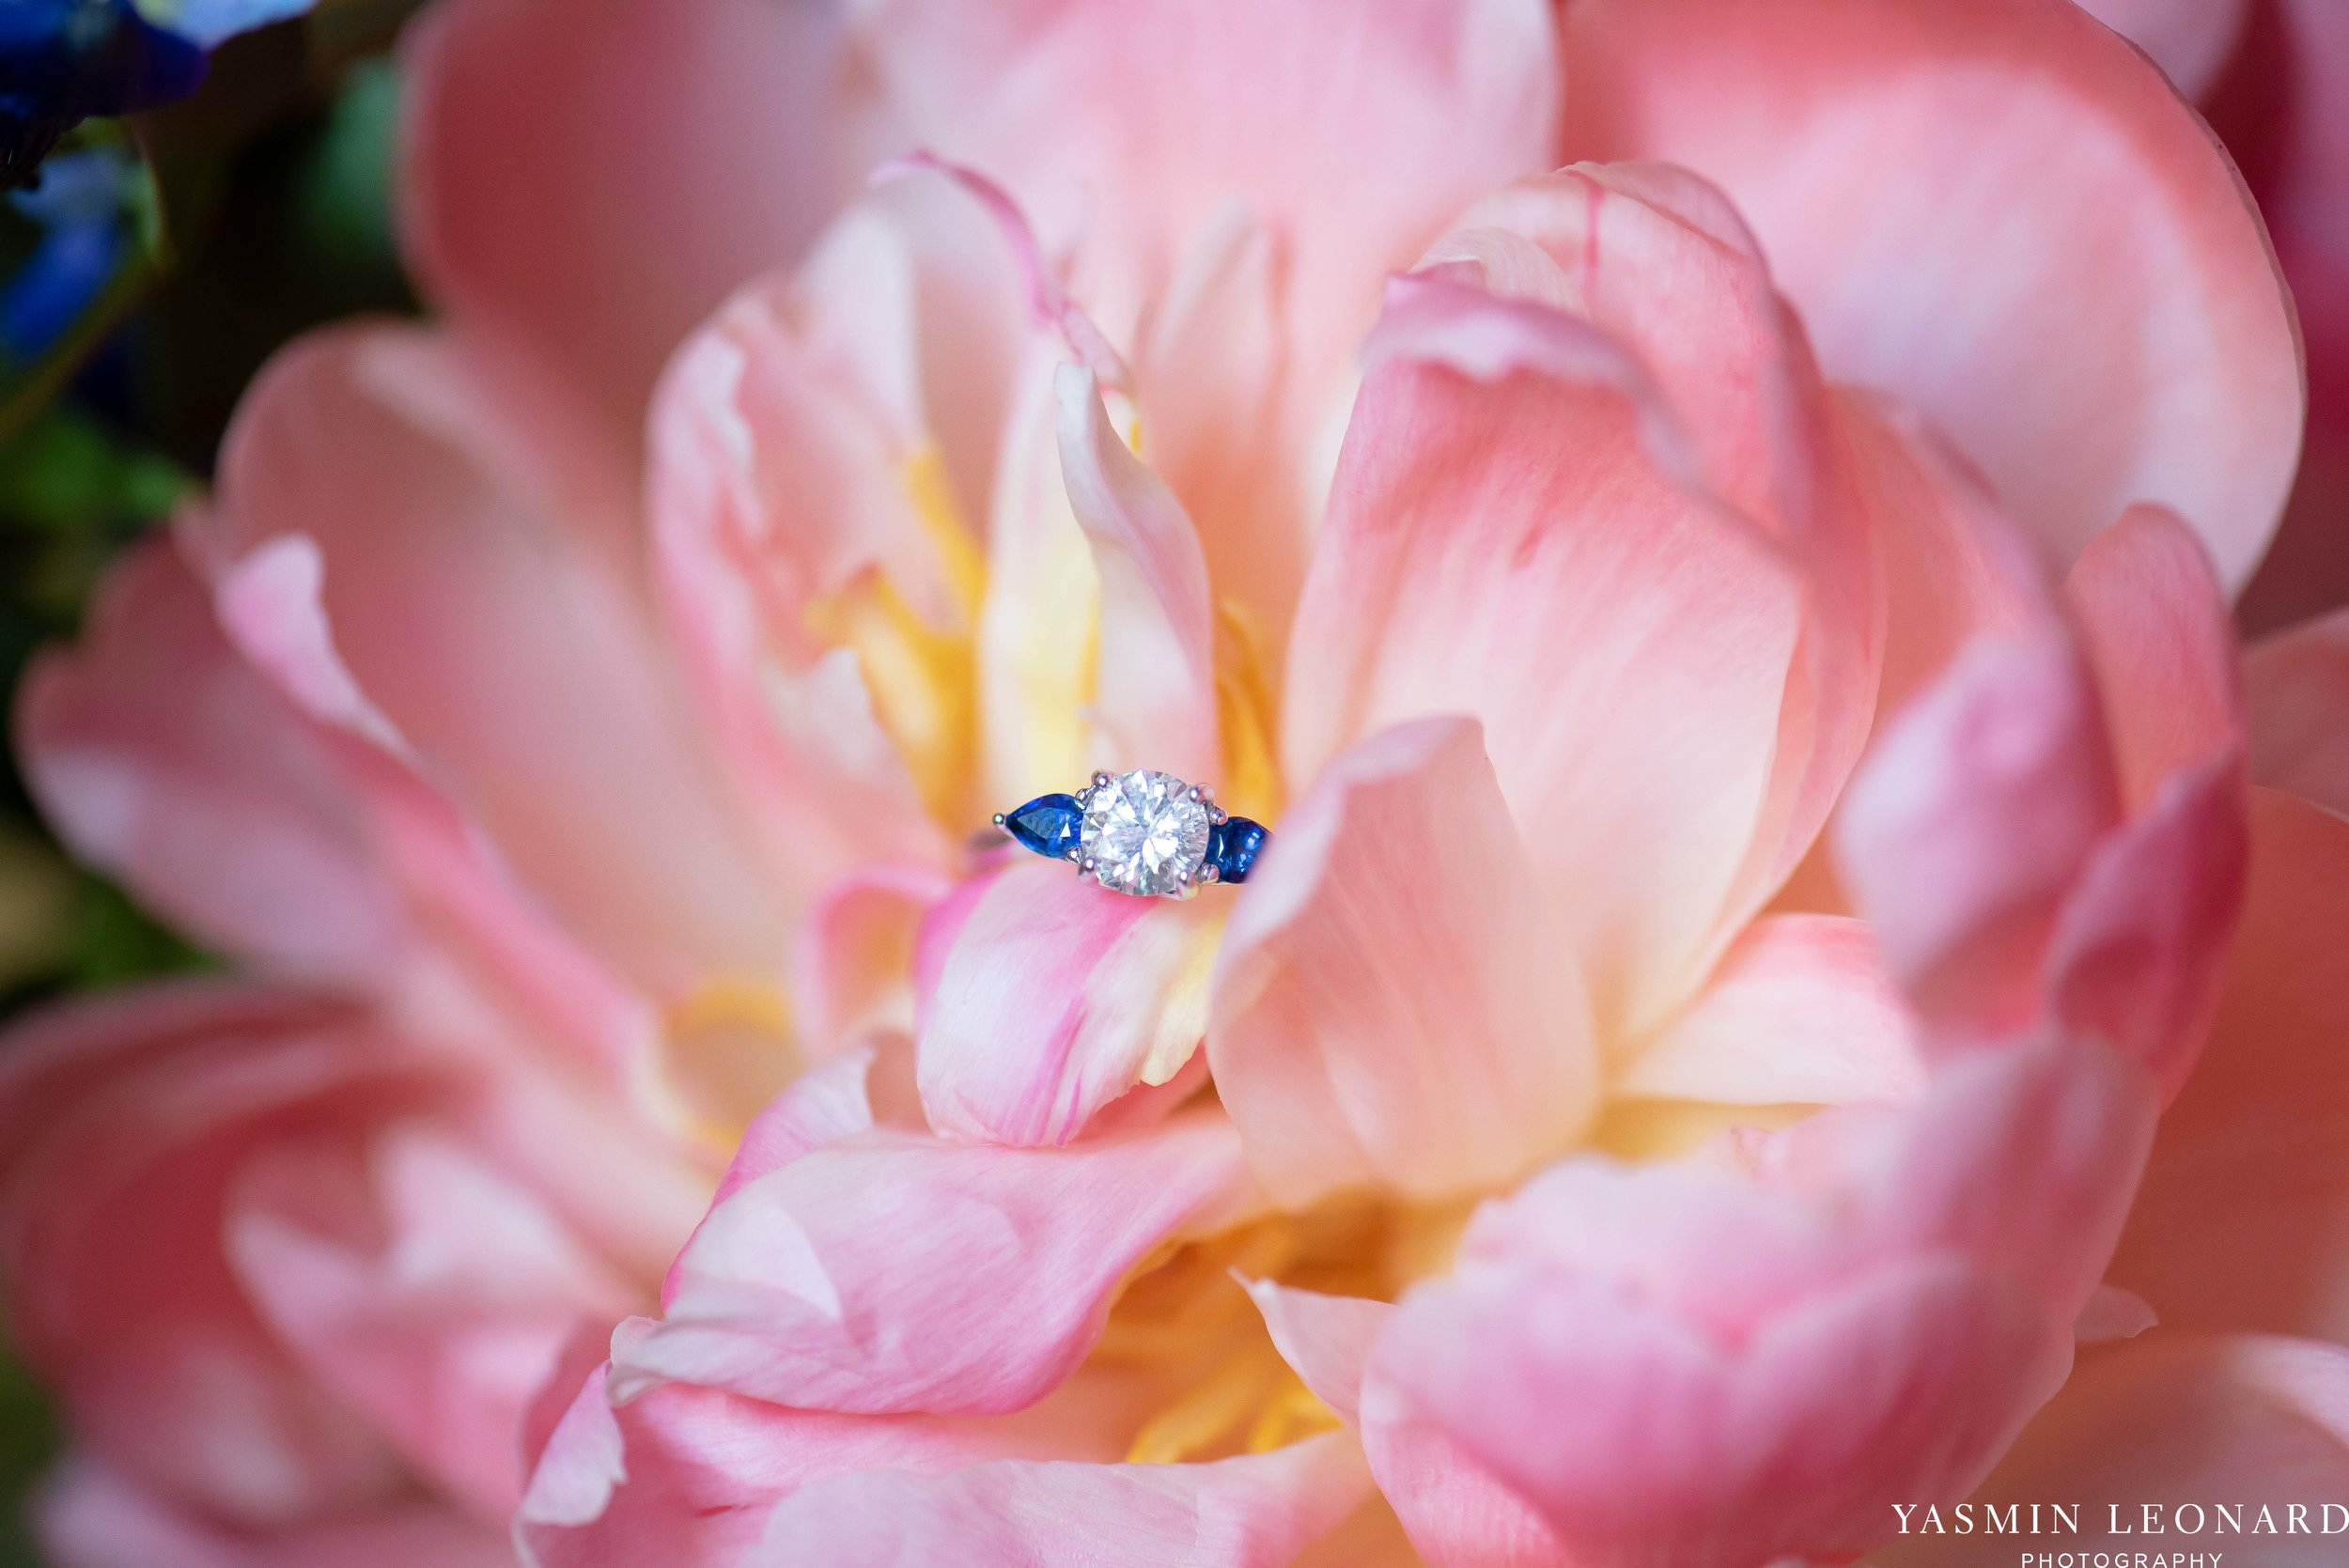 Old Homeplace Vineyard - NC Weddings - Outdoor Summer Weddings - Peony Boutique - Vineyard Wedding - NC Photographer - Yasmin Leonard Photography-3.jpg